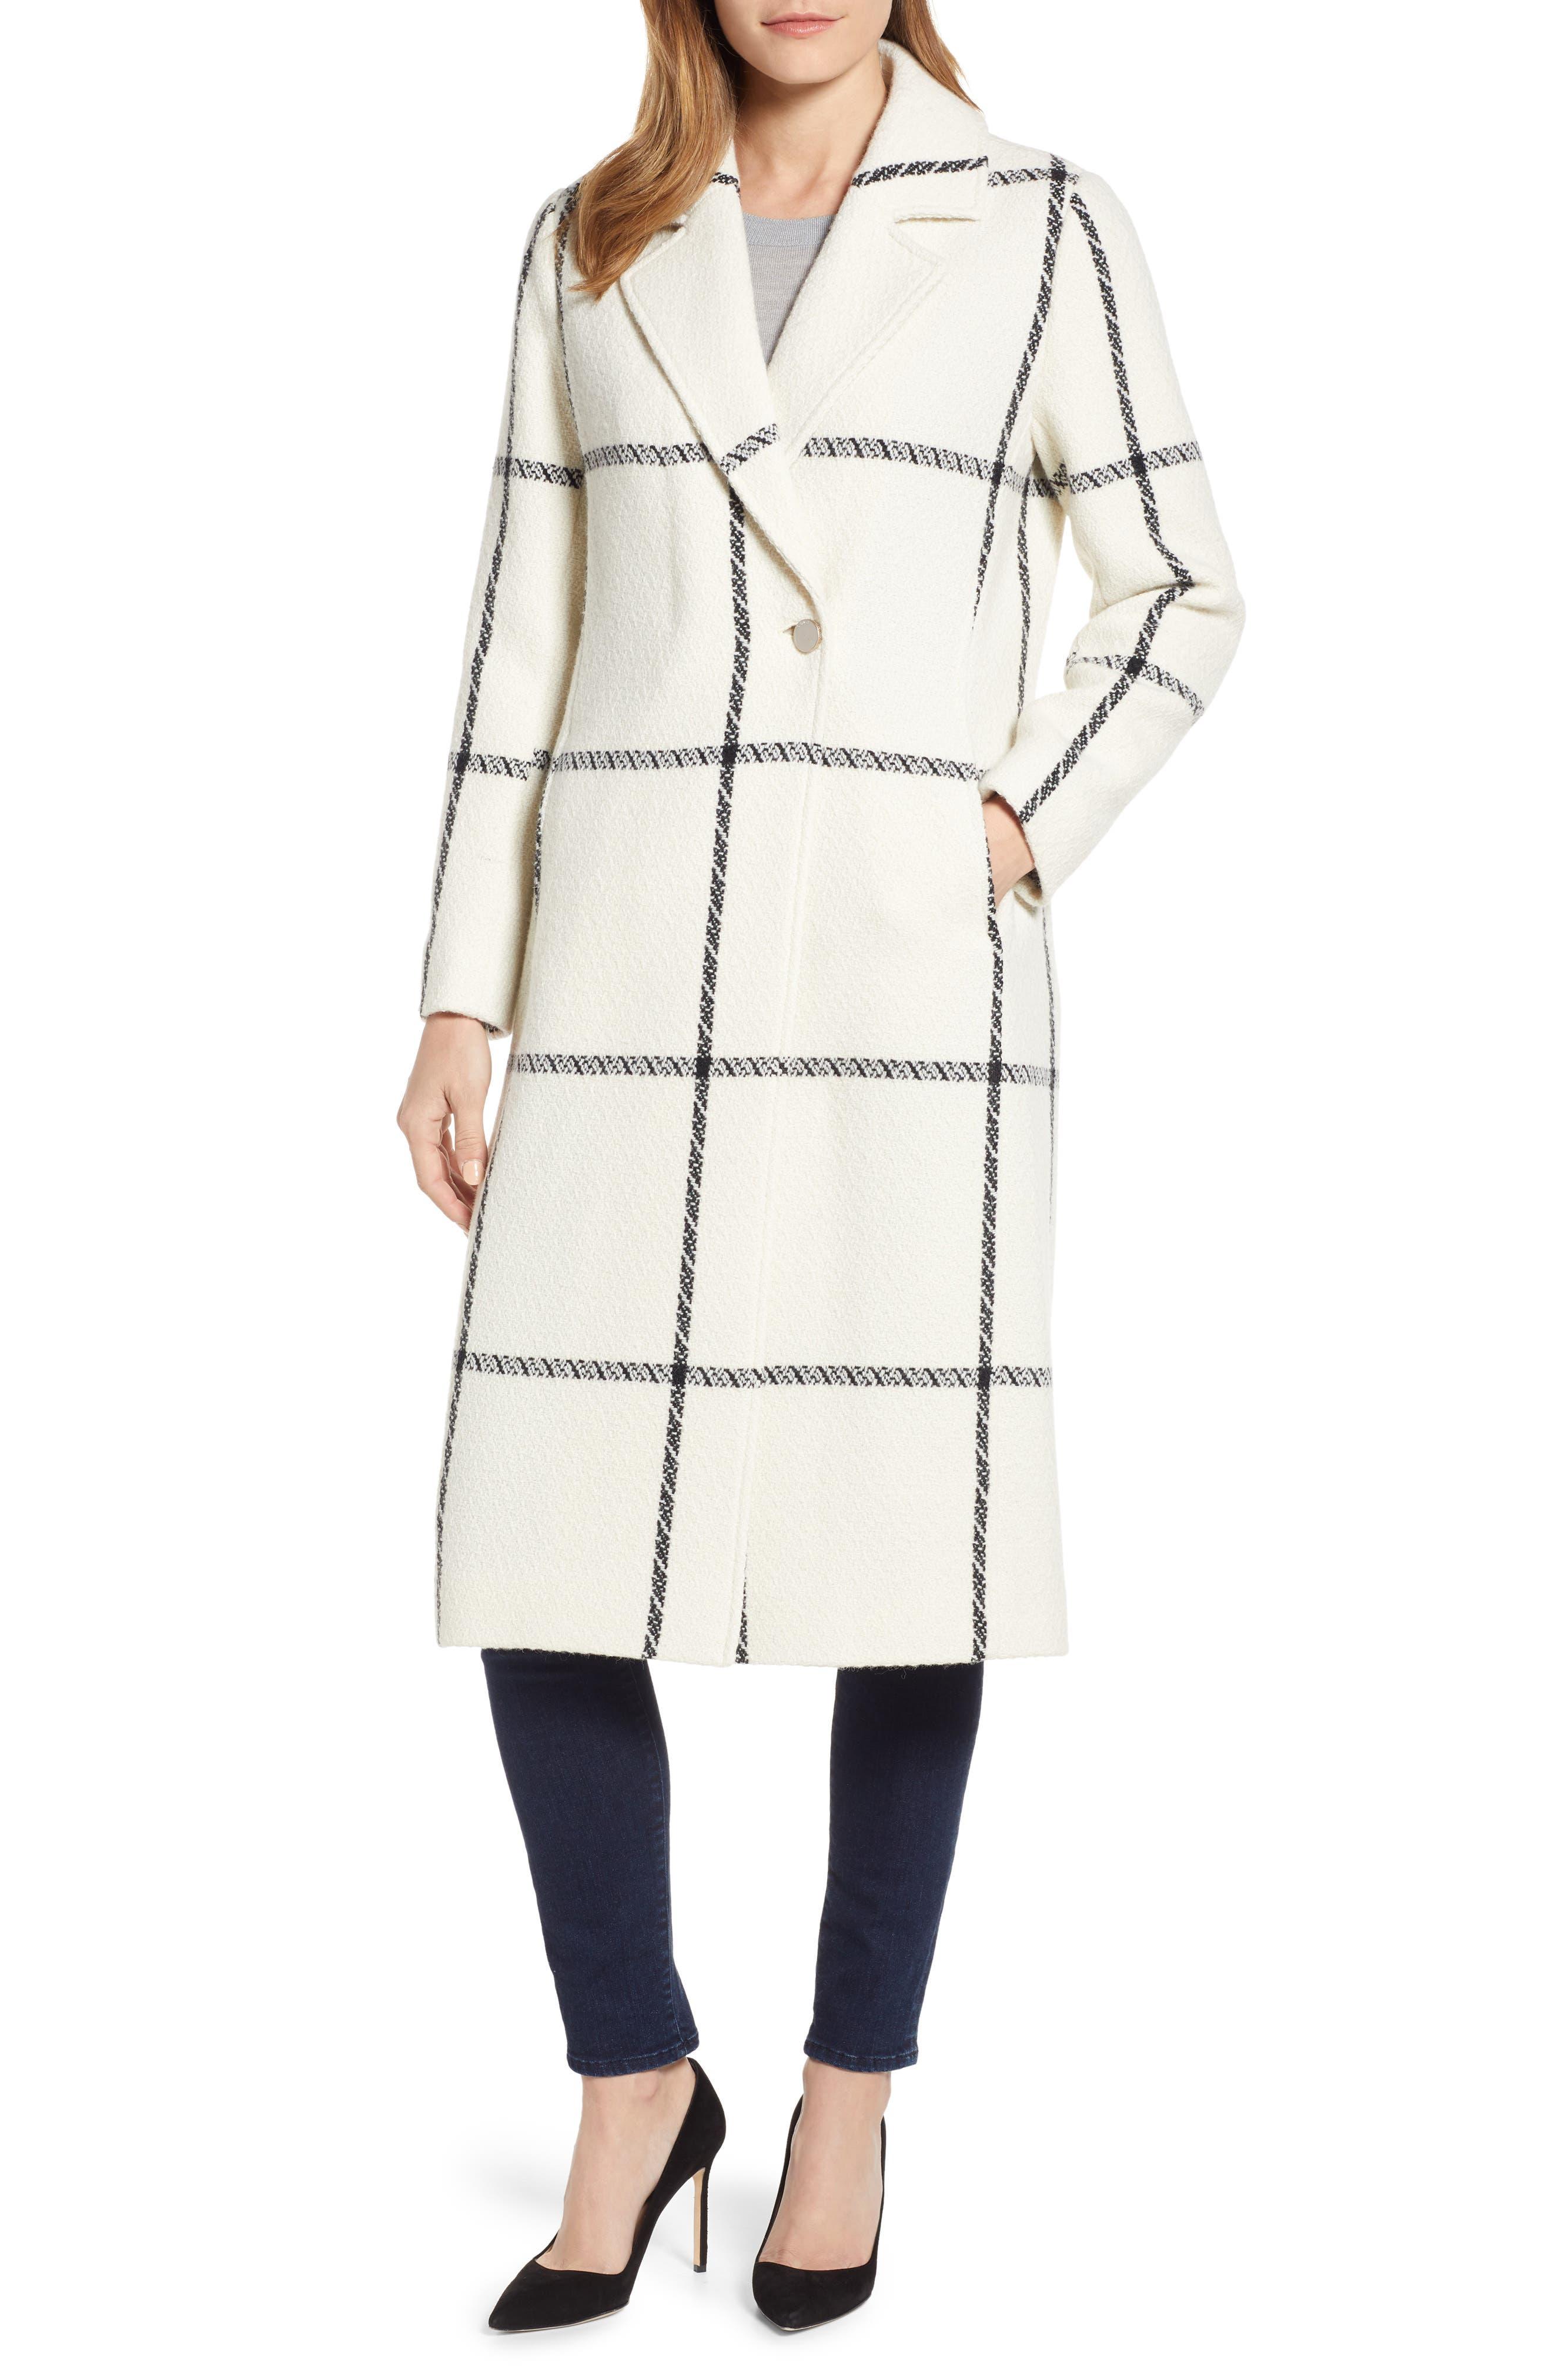 TED BAKER LONDON,                             Soniq Check Wool Blend Long Coat,                             Main thumbnail 1, color,                             92-IVORY